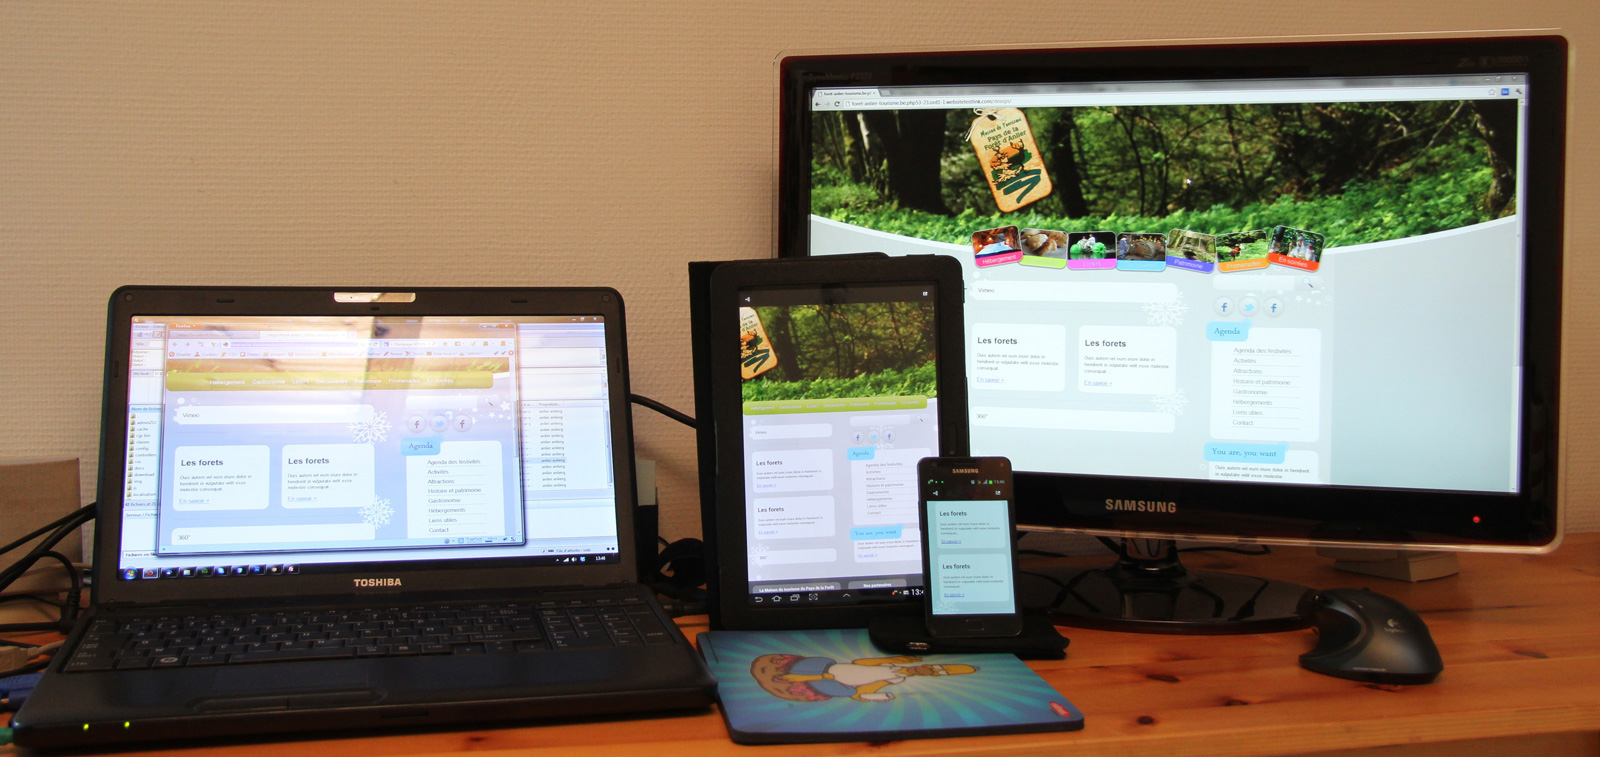 smartphone tablette pc bient t tax s meilleur mobile. Black Bedroom Furniture Sets. Home Design Ideas